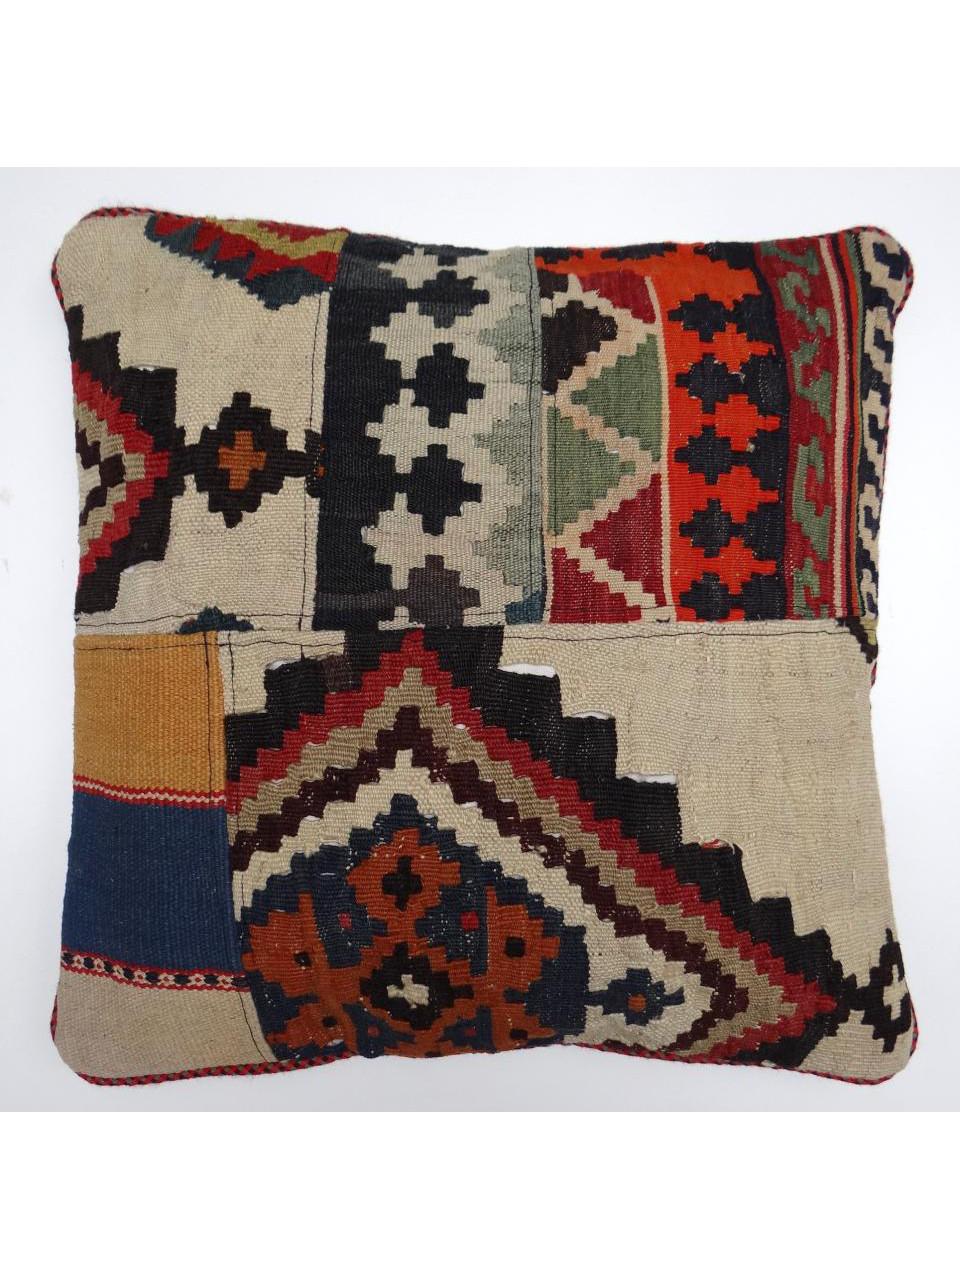 coussin kilim shahsavan coussins persans n 1478 50x50cm. Black Bedroom Furniture Sets. Home Design Ideas